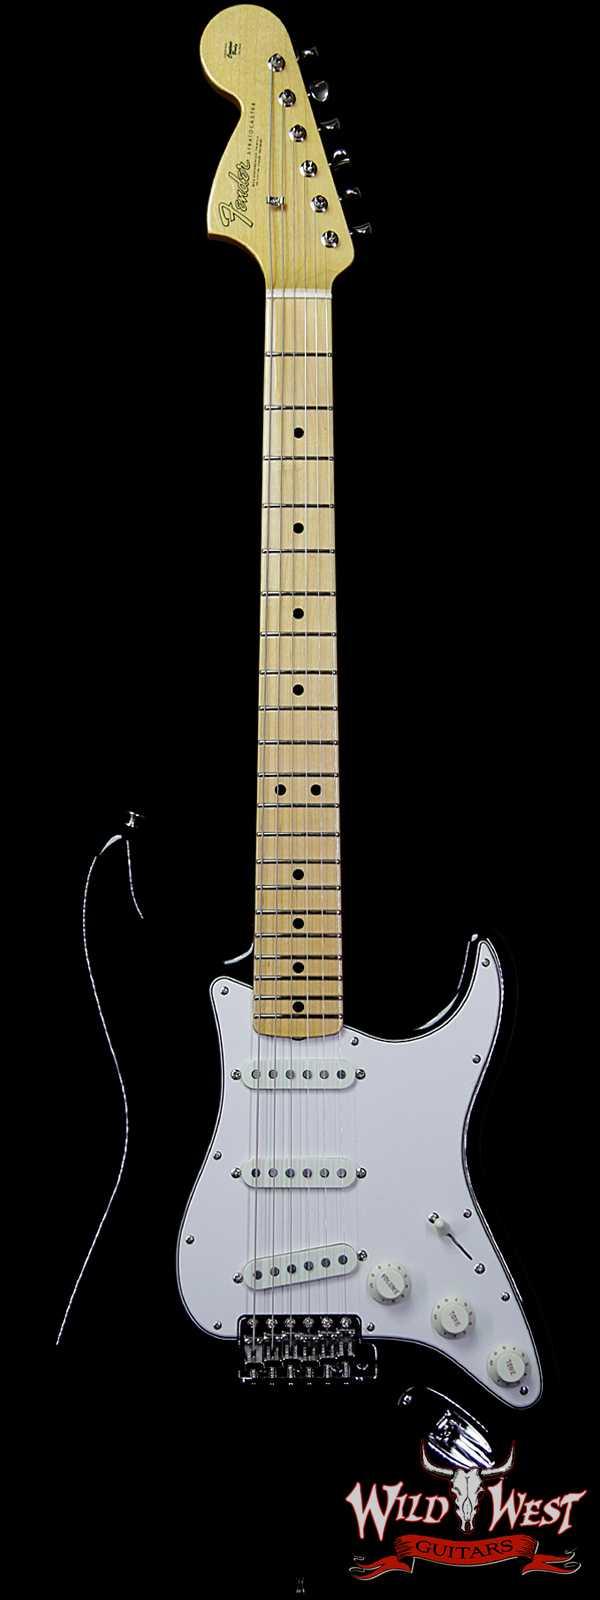 Fender Custom Shop Jimi Hendrix Signature Voodoo Child Stratocaster NOS Reverse Fat Headstock Black